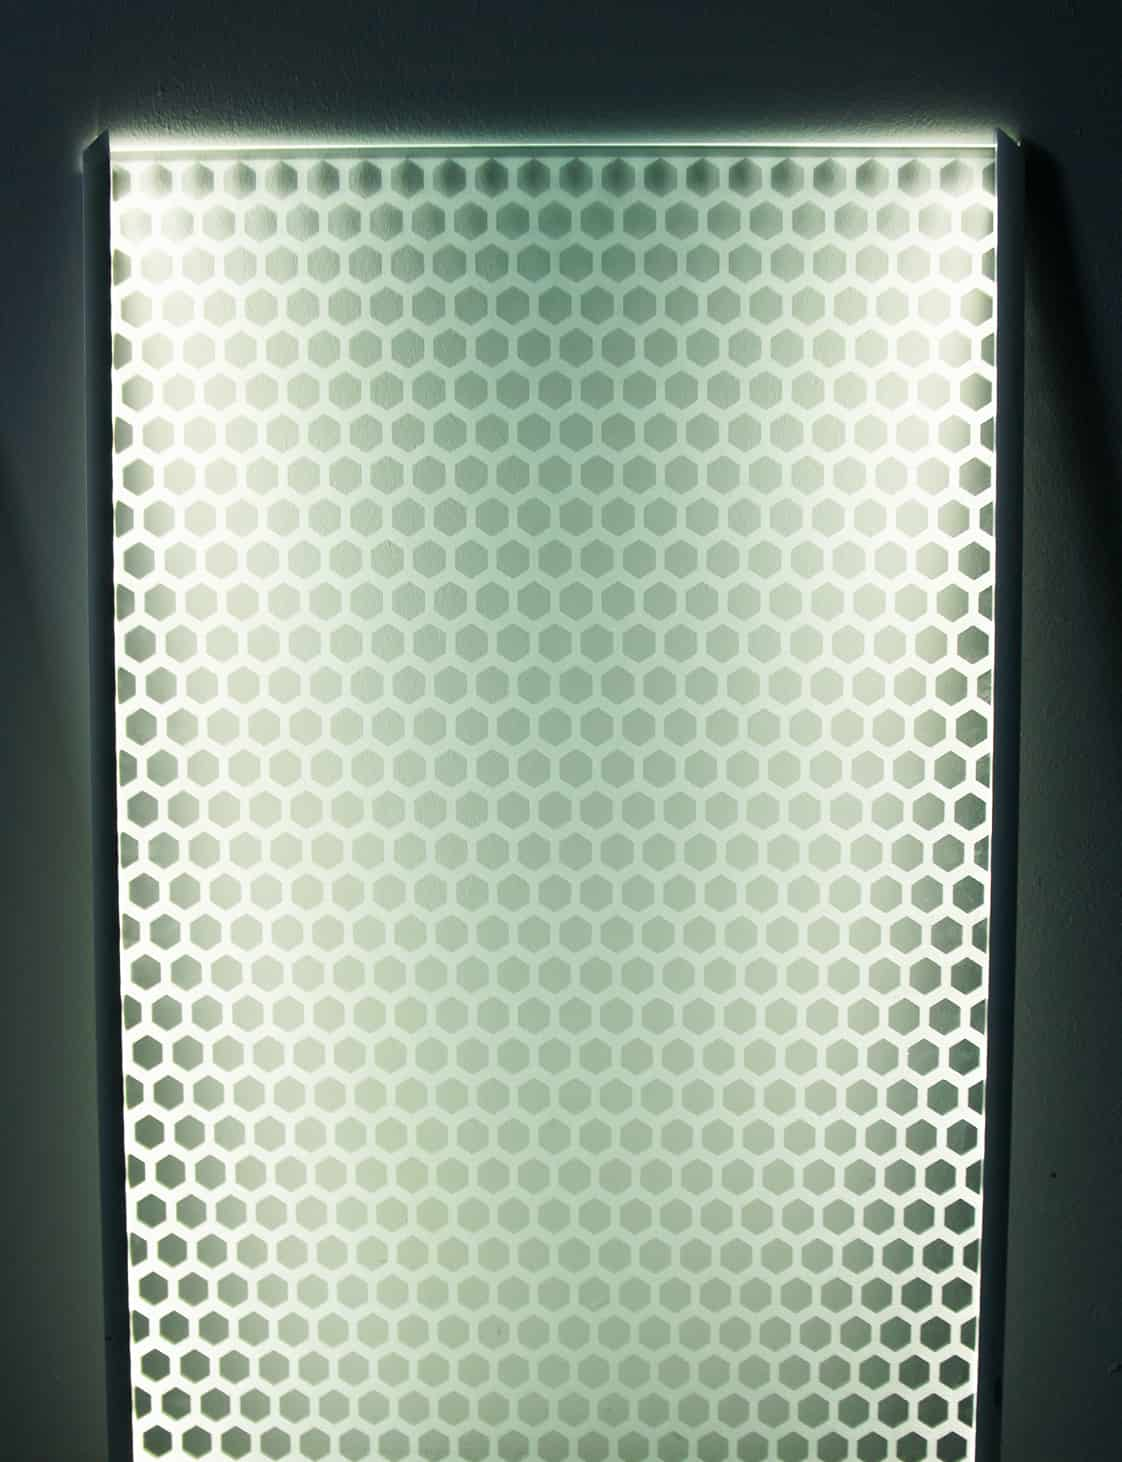 Luminescent glass